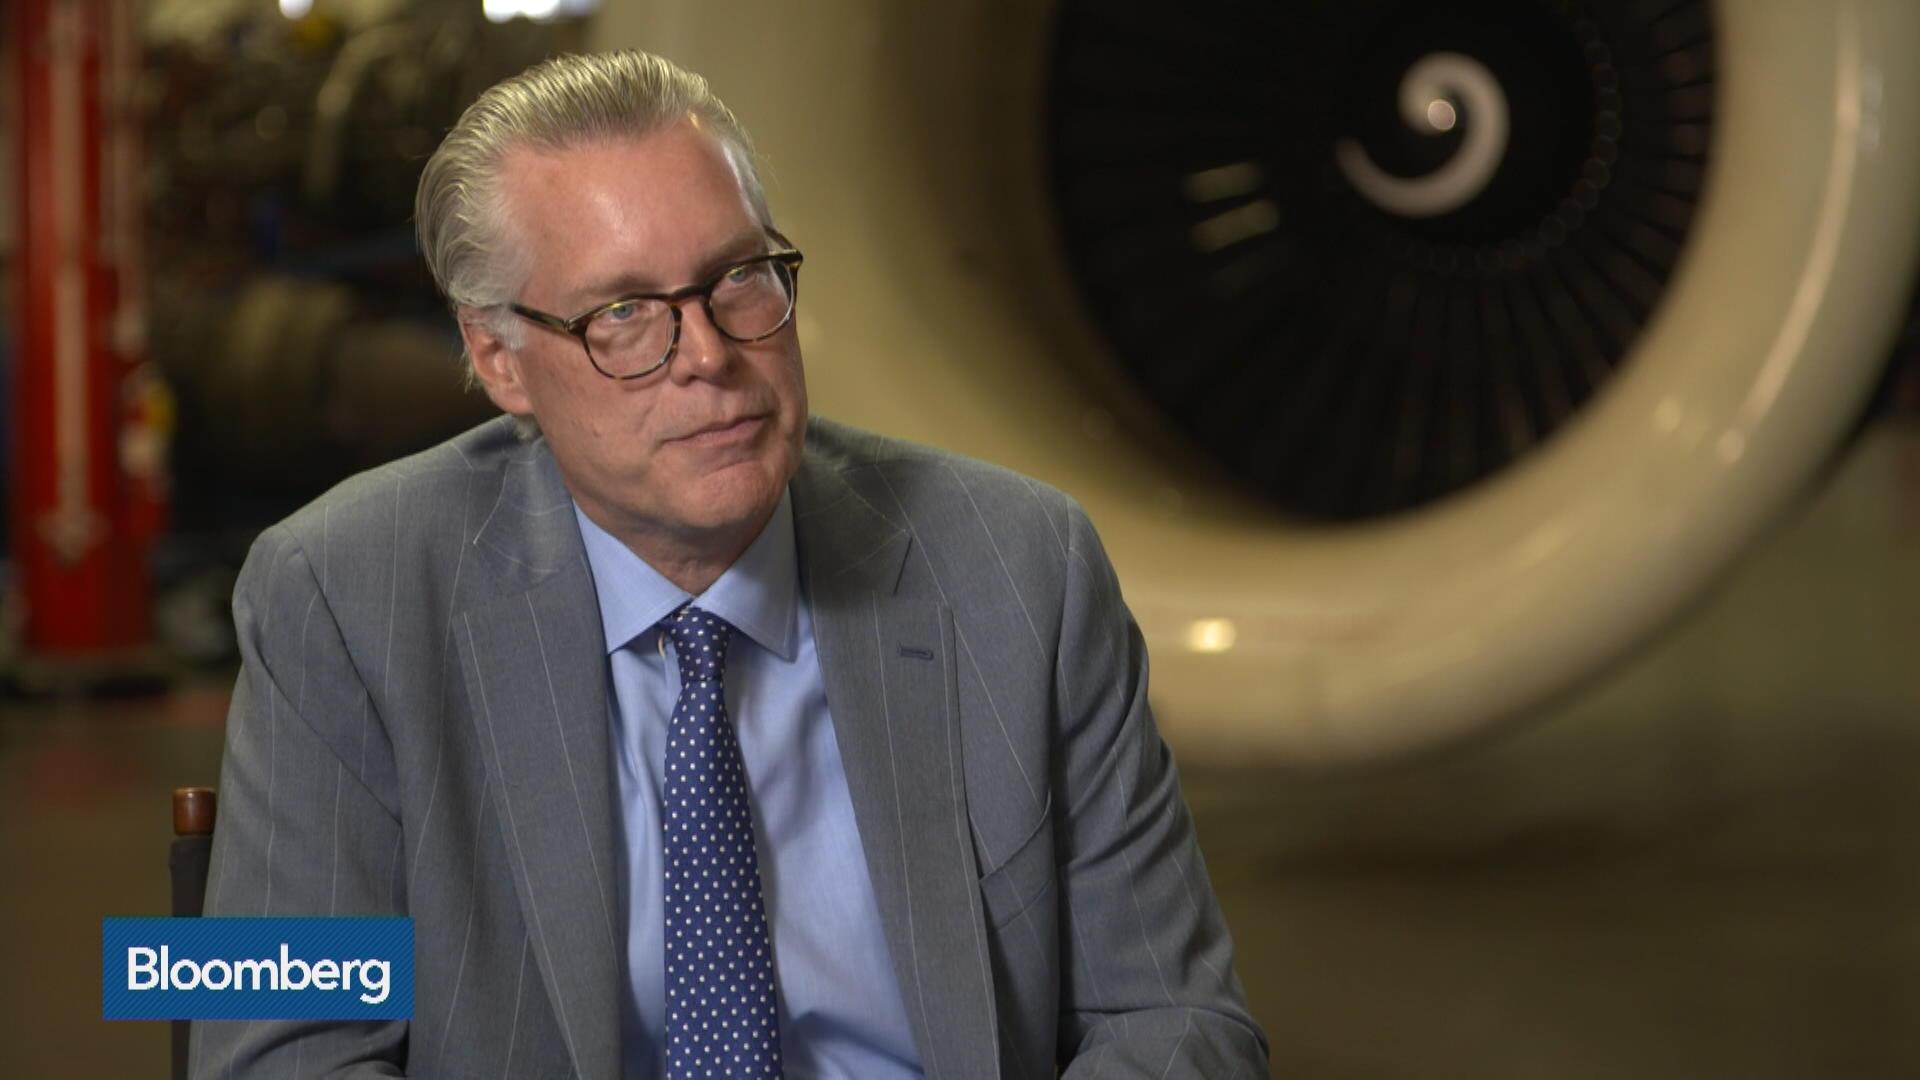 Boeing deepens jetliner job cuts as risk of sales downturn looms bloomberg - Boeing Deepens Jetliner Job Cuts As Risk Of Sales Downturn Looms Bloomberg 31